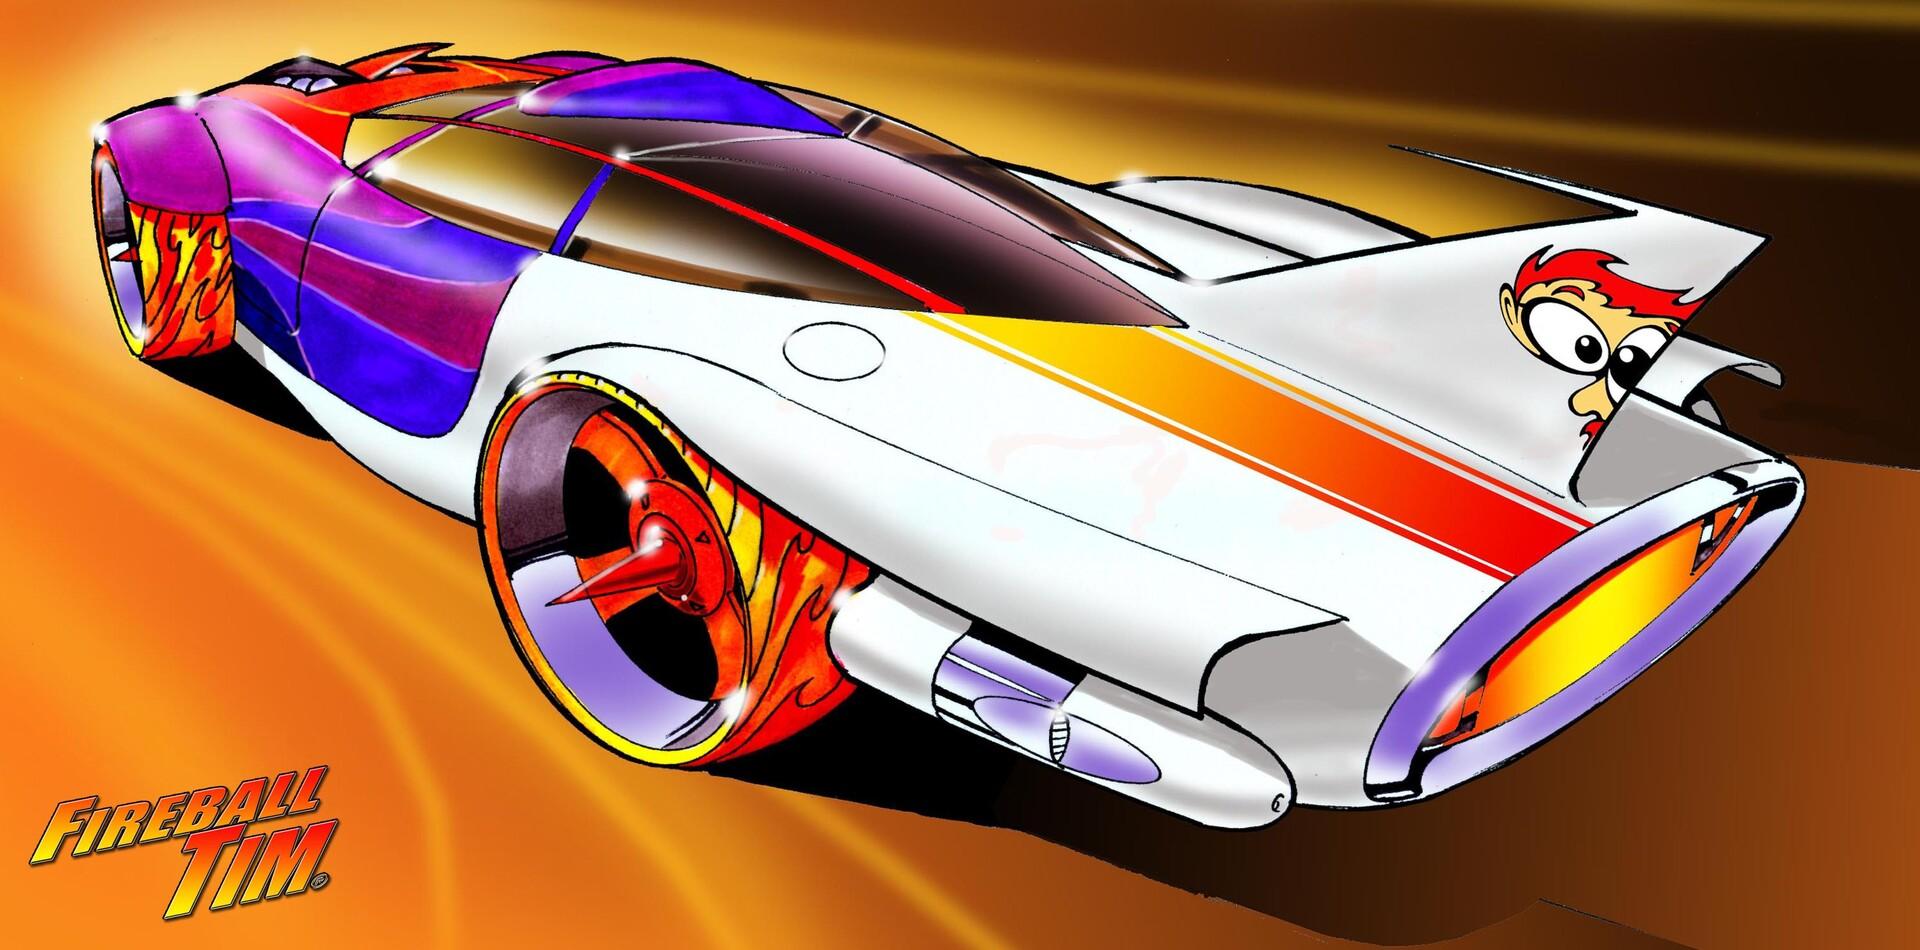 FIREBIRD 2 CONCEPT - Client - General Motors